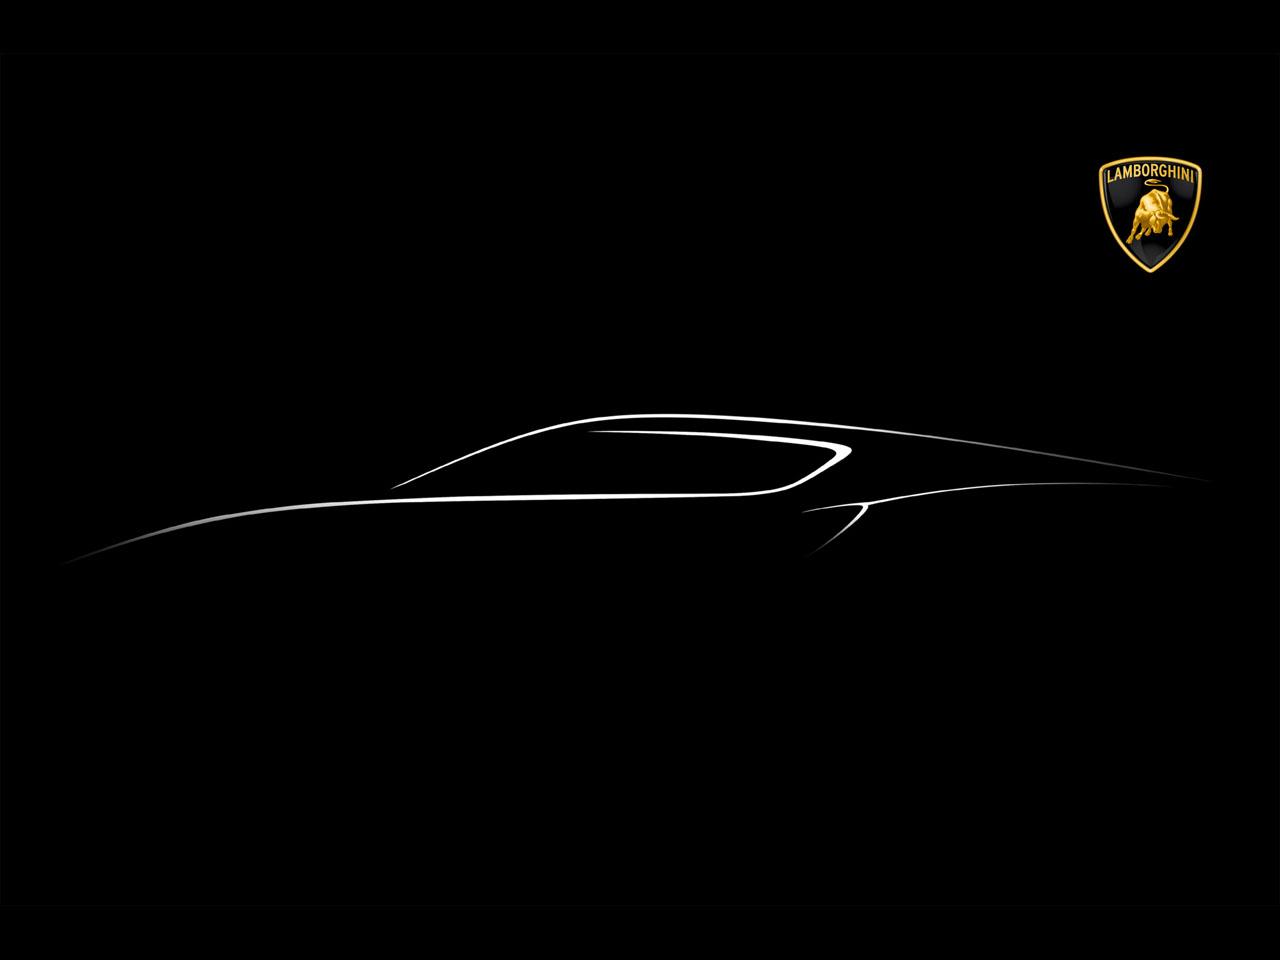 Lamborghini Teases Cryptic Caption Within Coupe Like Profile Image